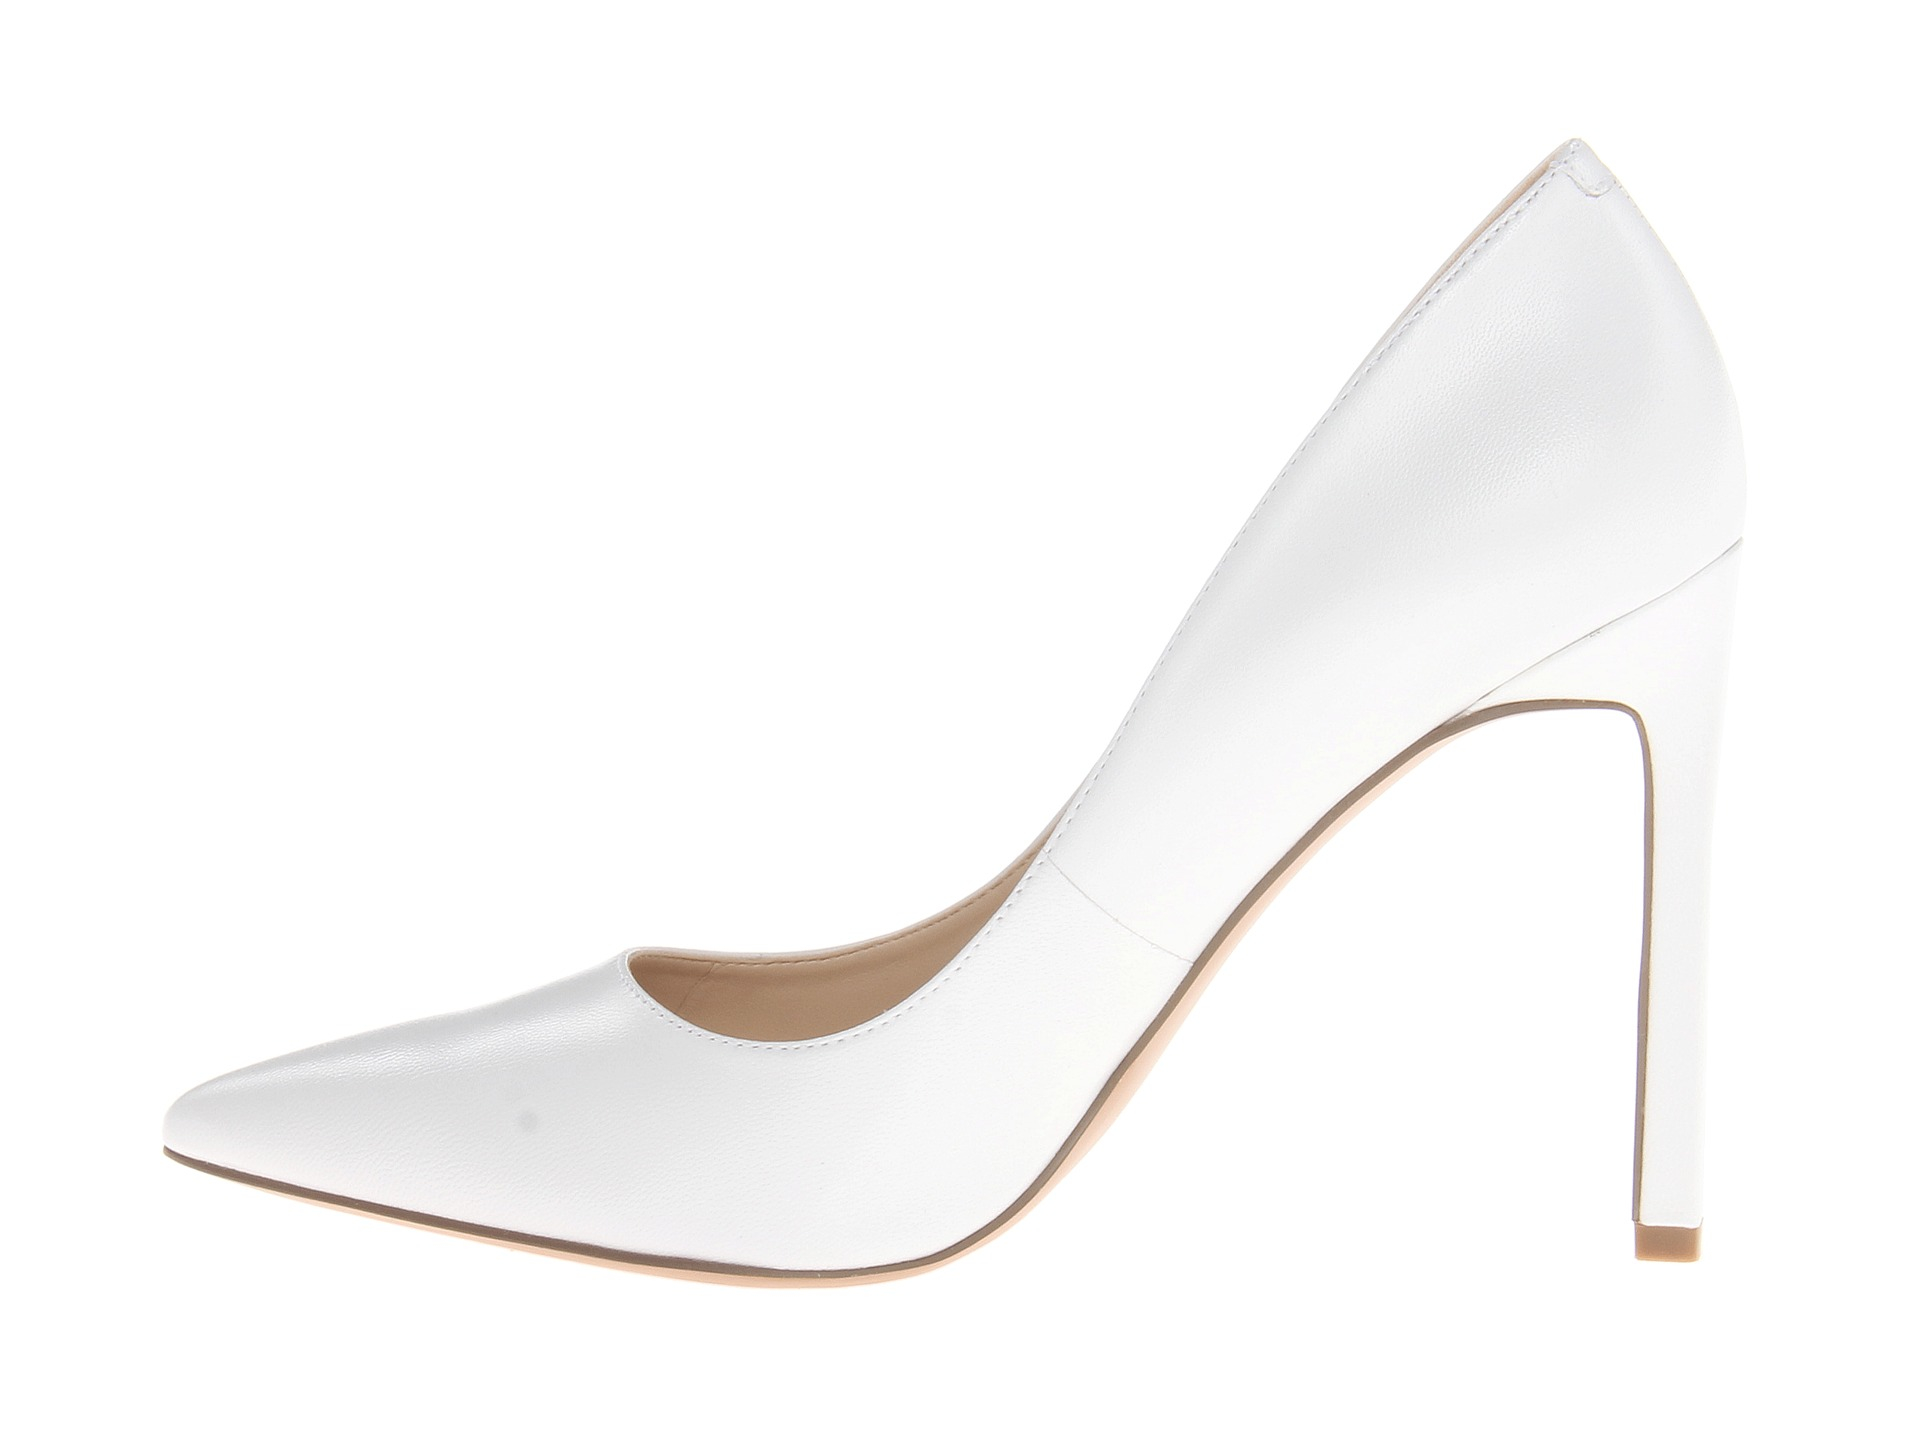 Nine West Tatiana in White Leather